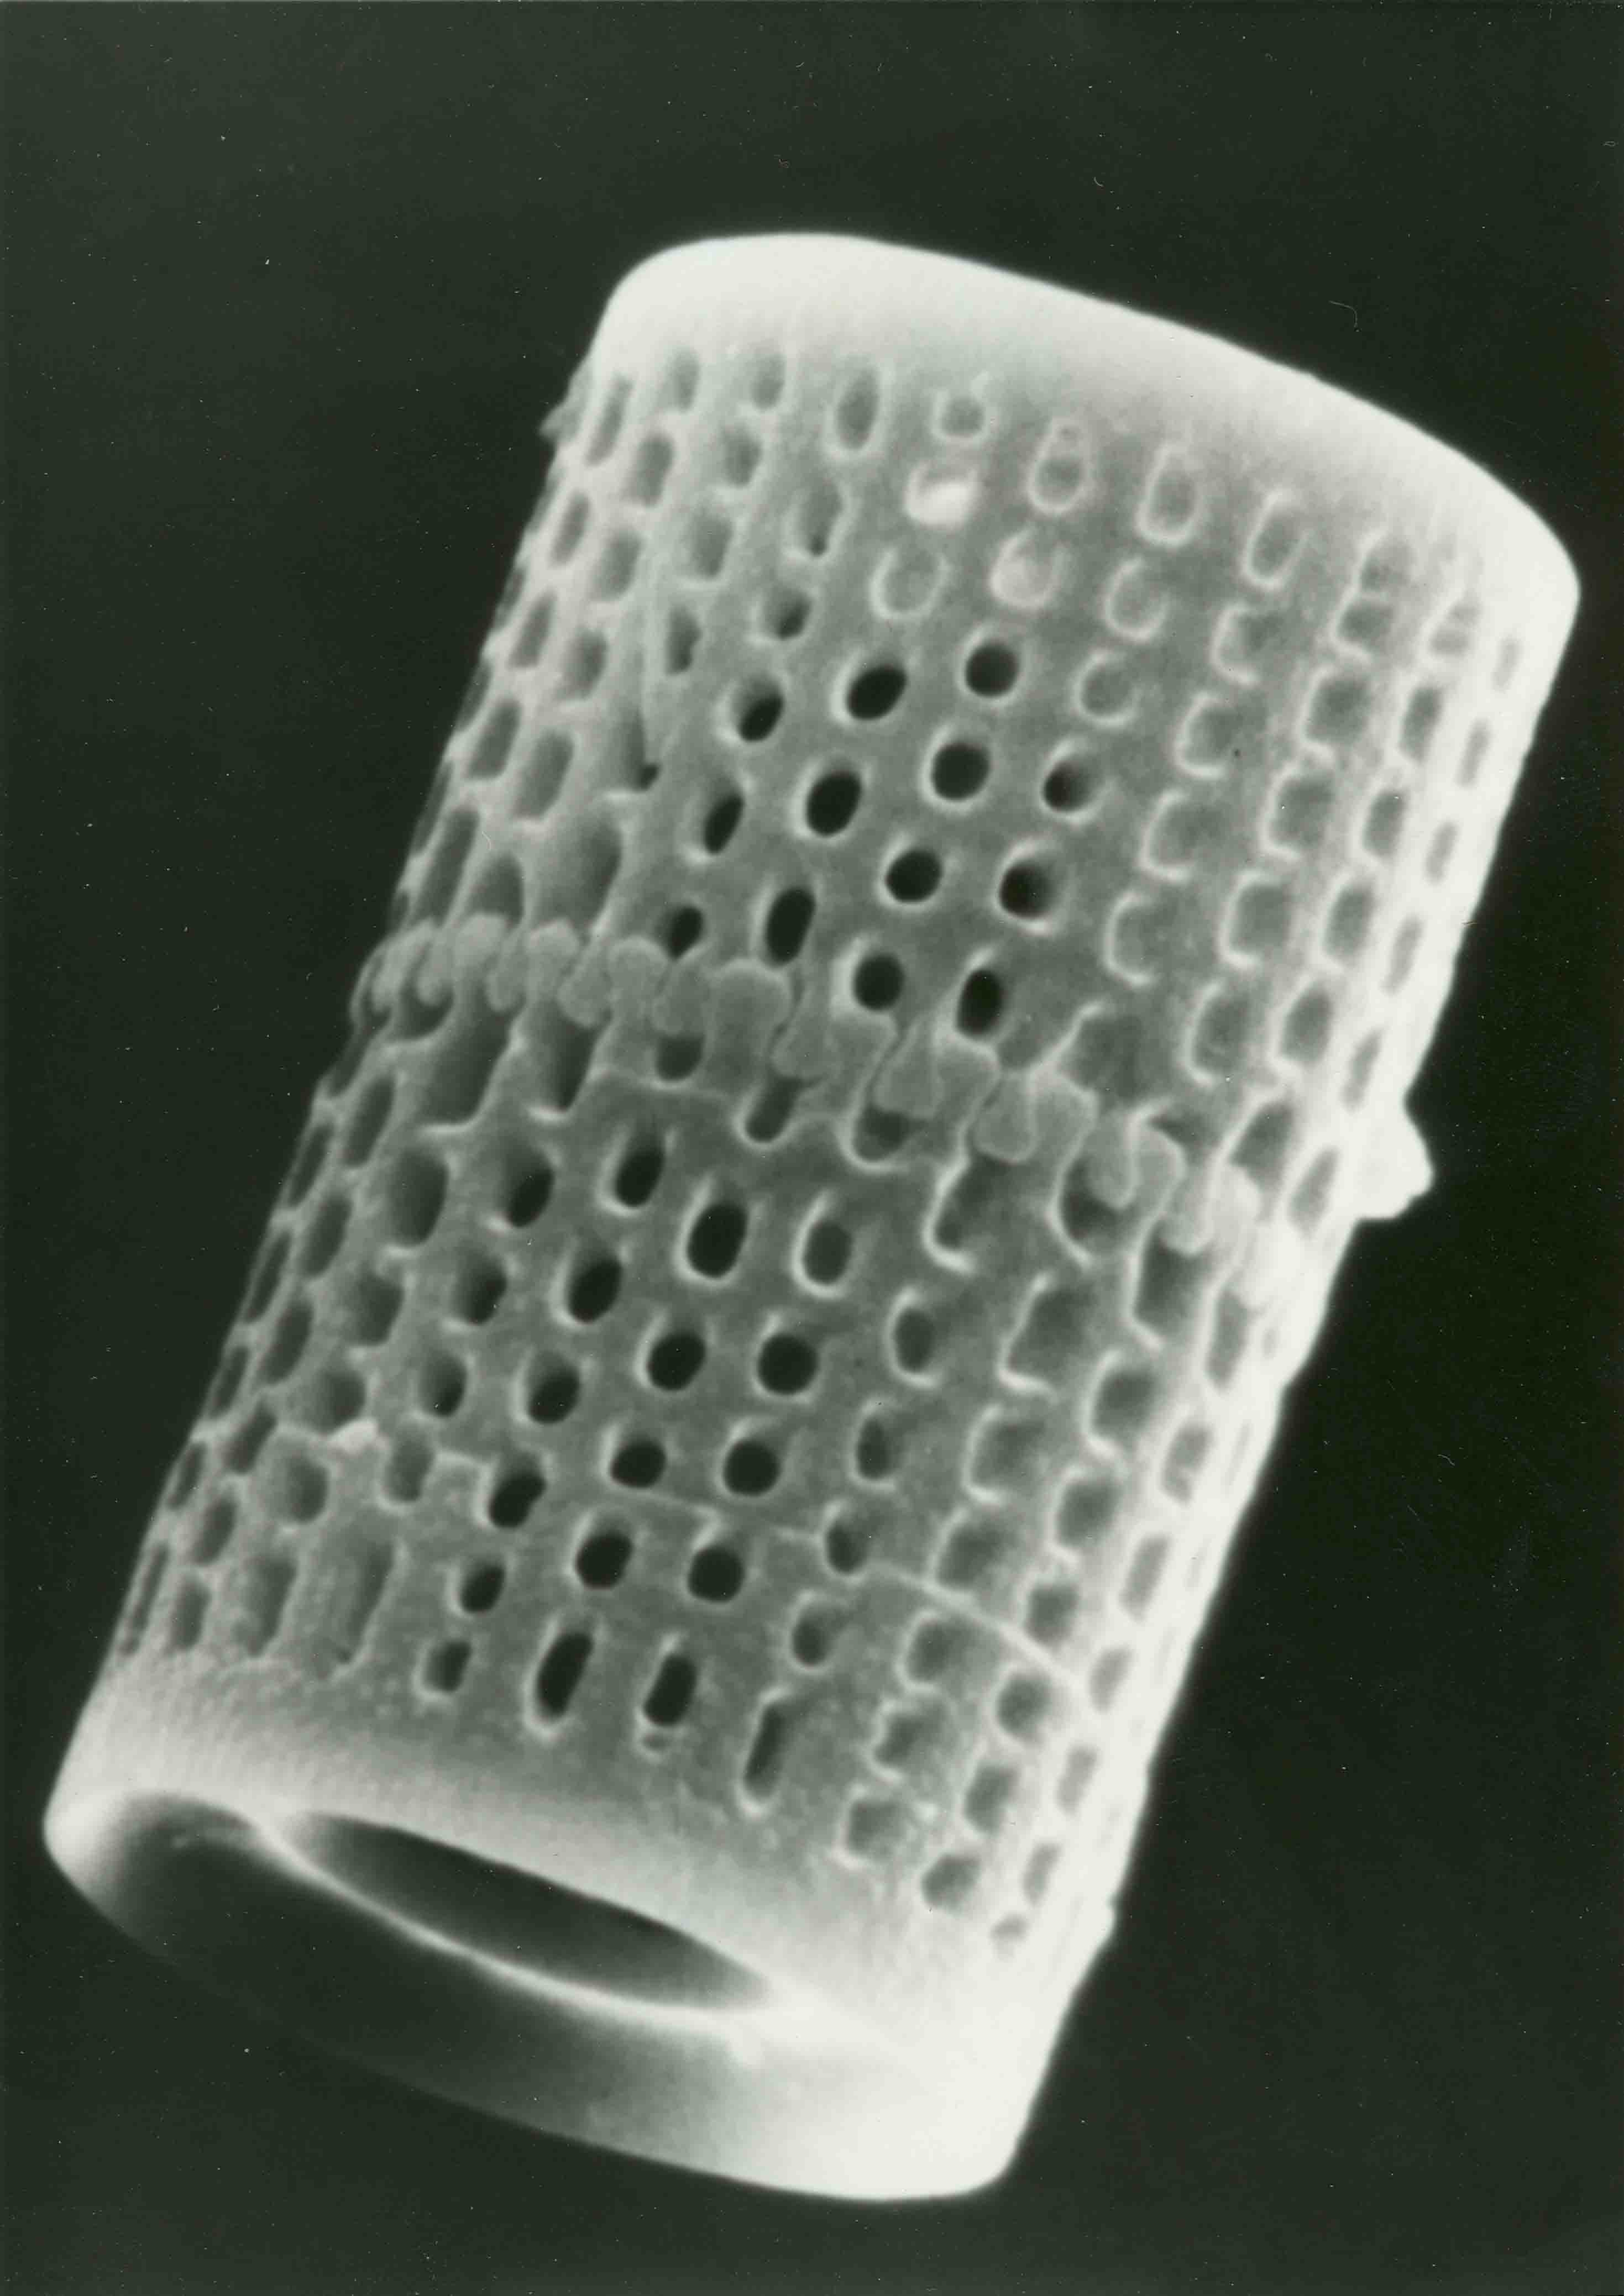 Single_Diatom_-_Large.jpg